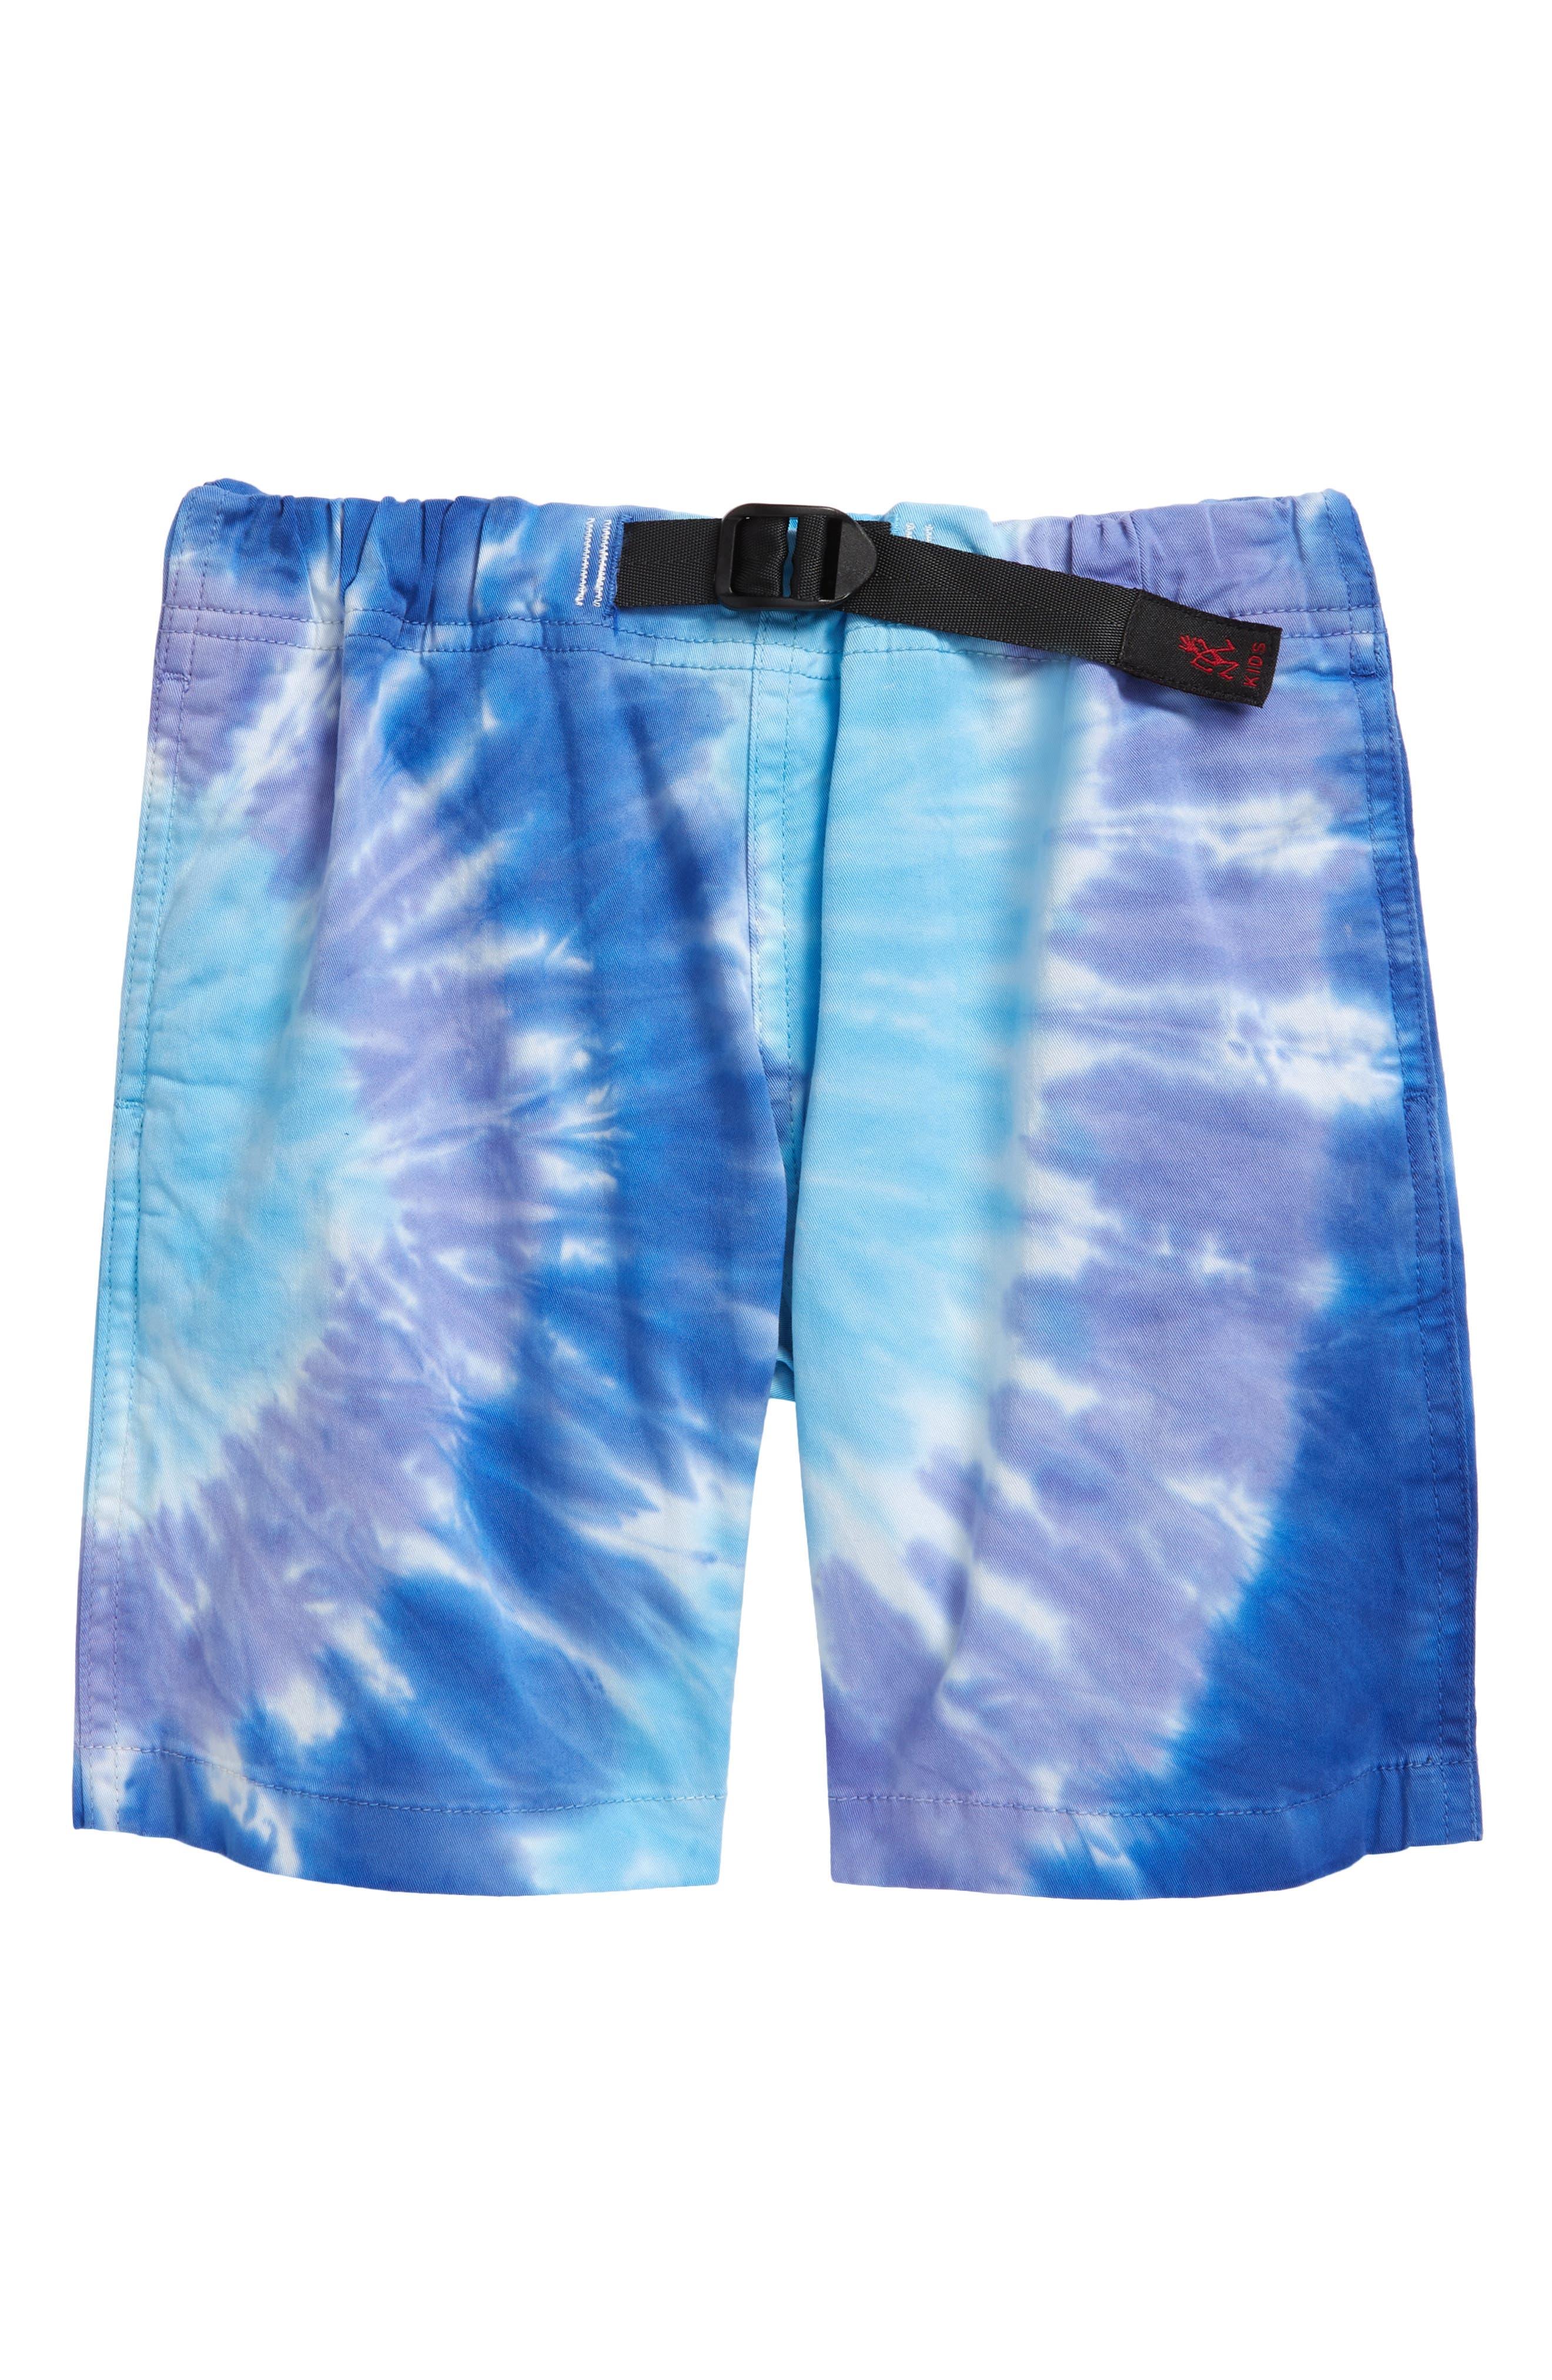 Kids' Tie Dye G-Shorts